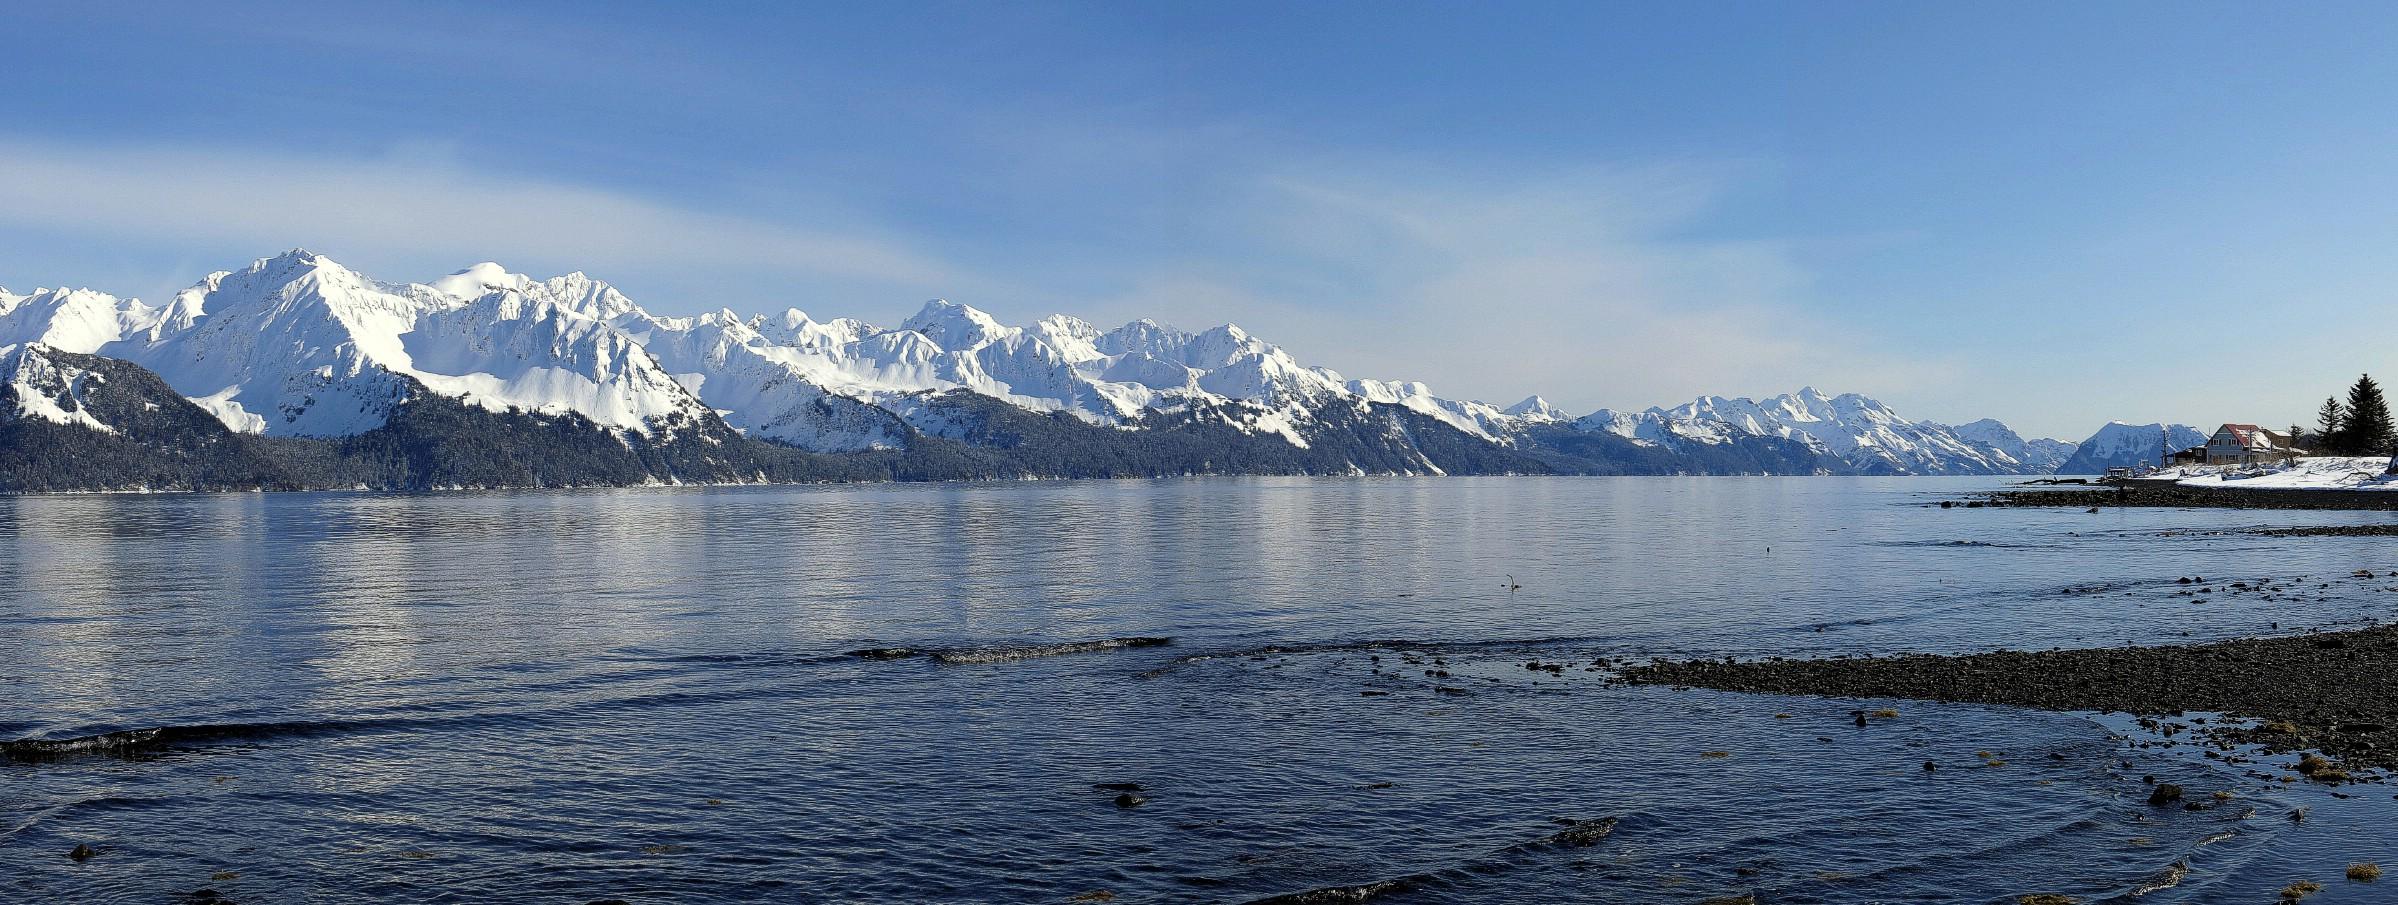 A panorama from the edge of Resurrection Bay, Lowell Point, Kenai Peninsula, Alaska, USA. March 13th 2013.